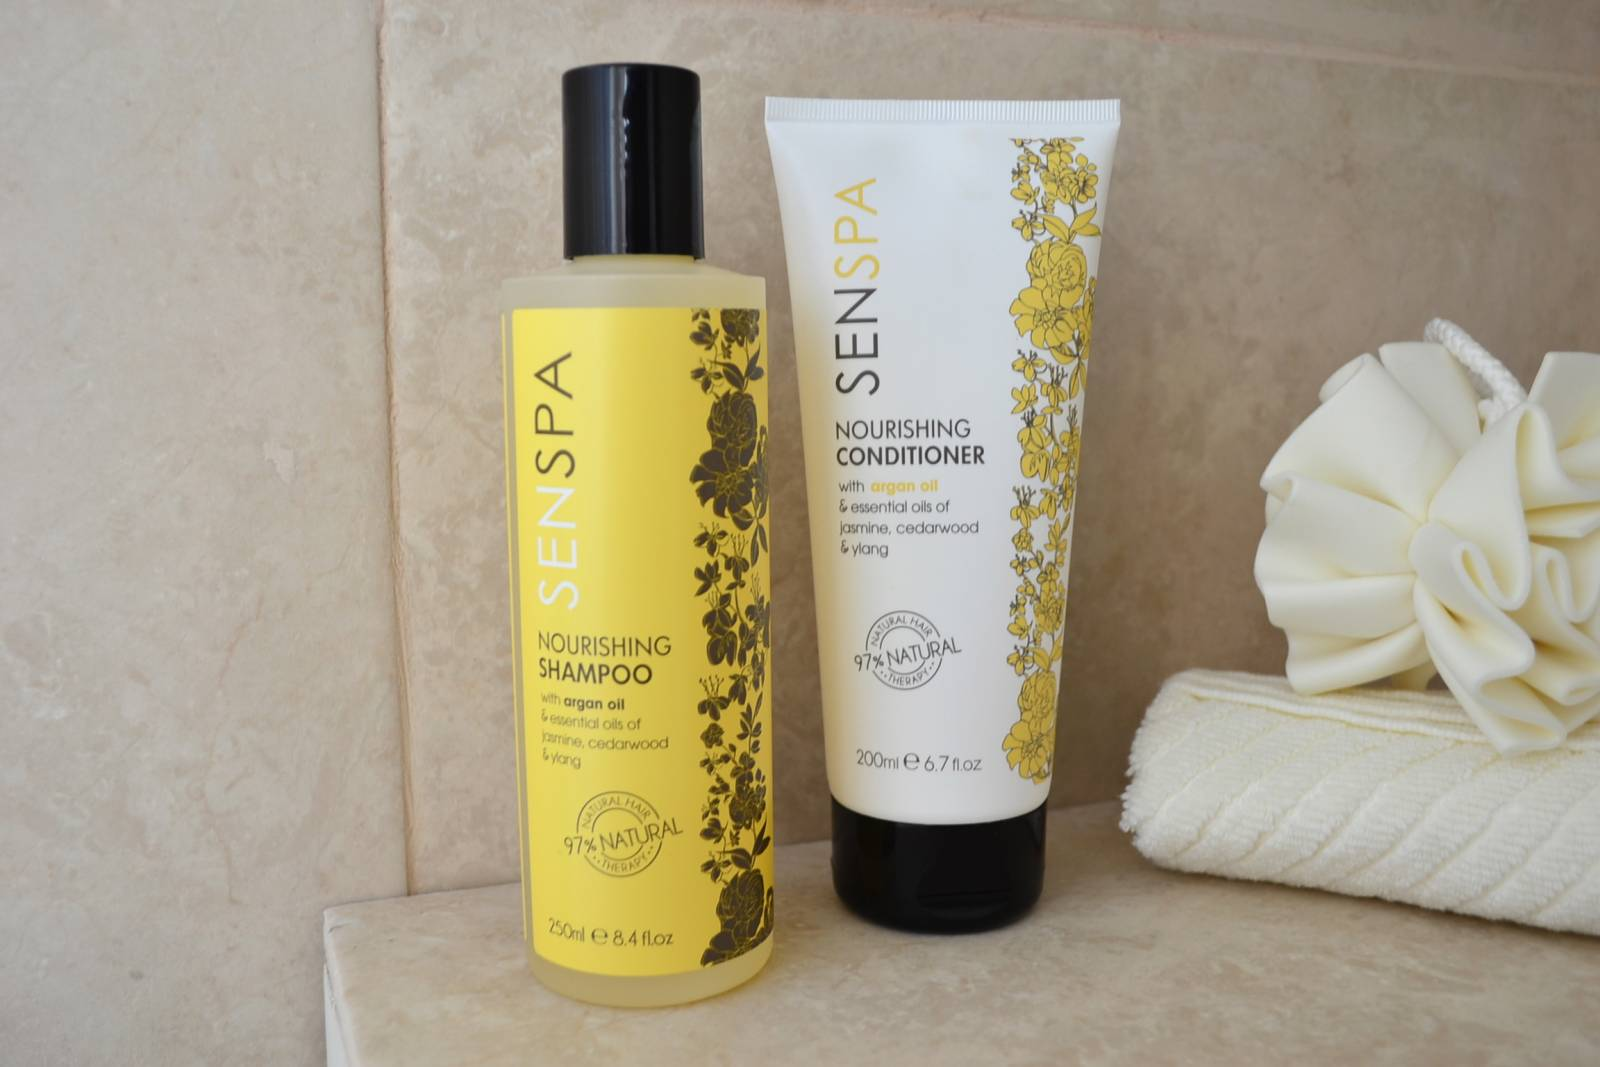 senspa-nourishing-shampoo-conditioner